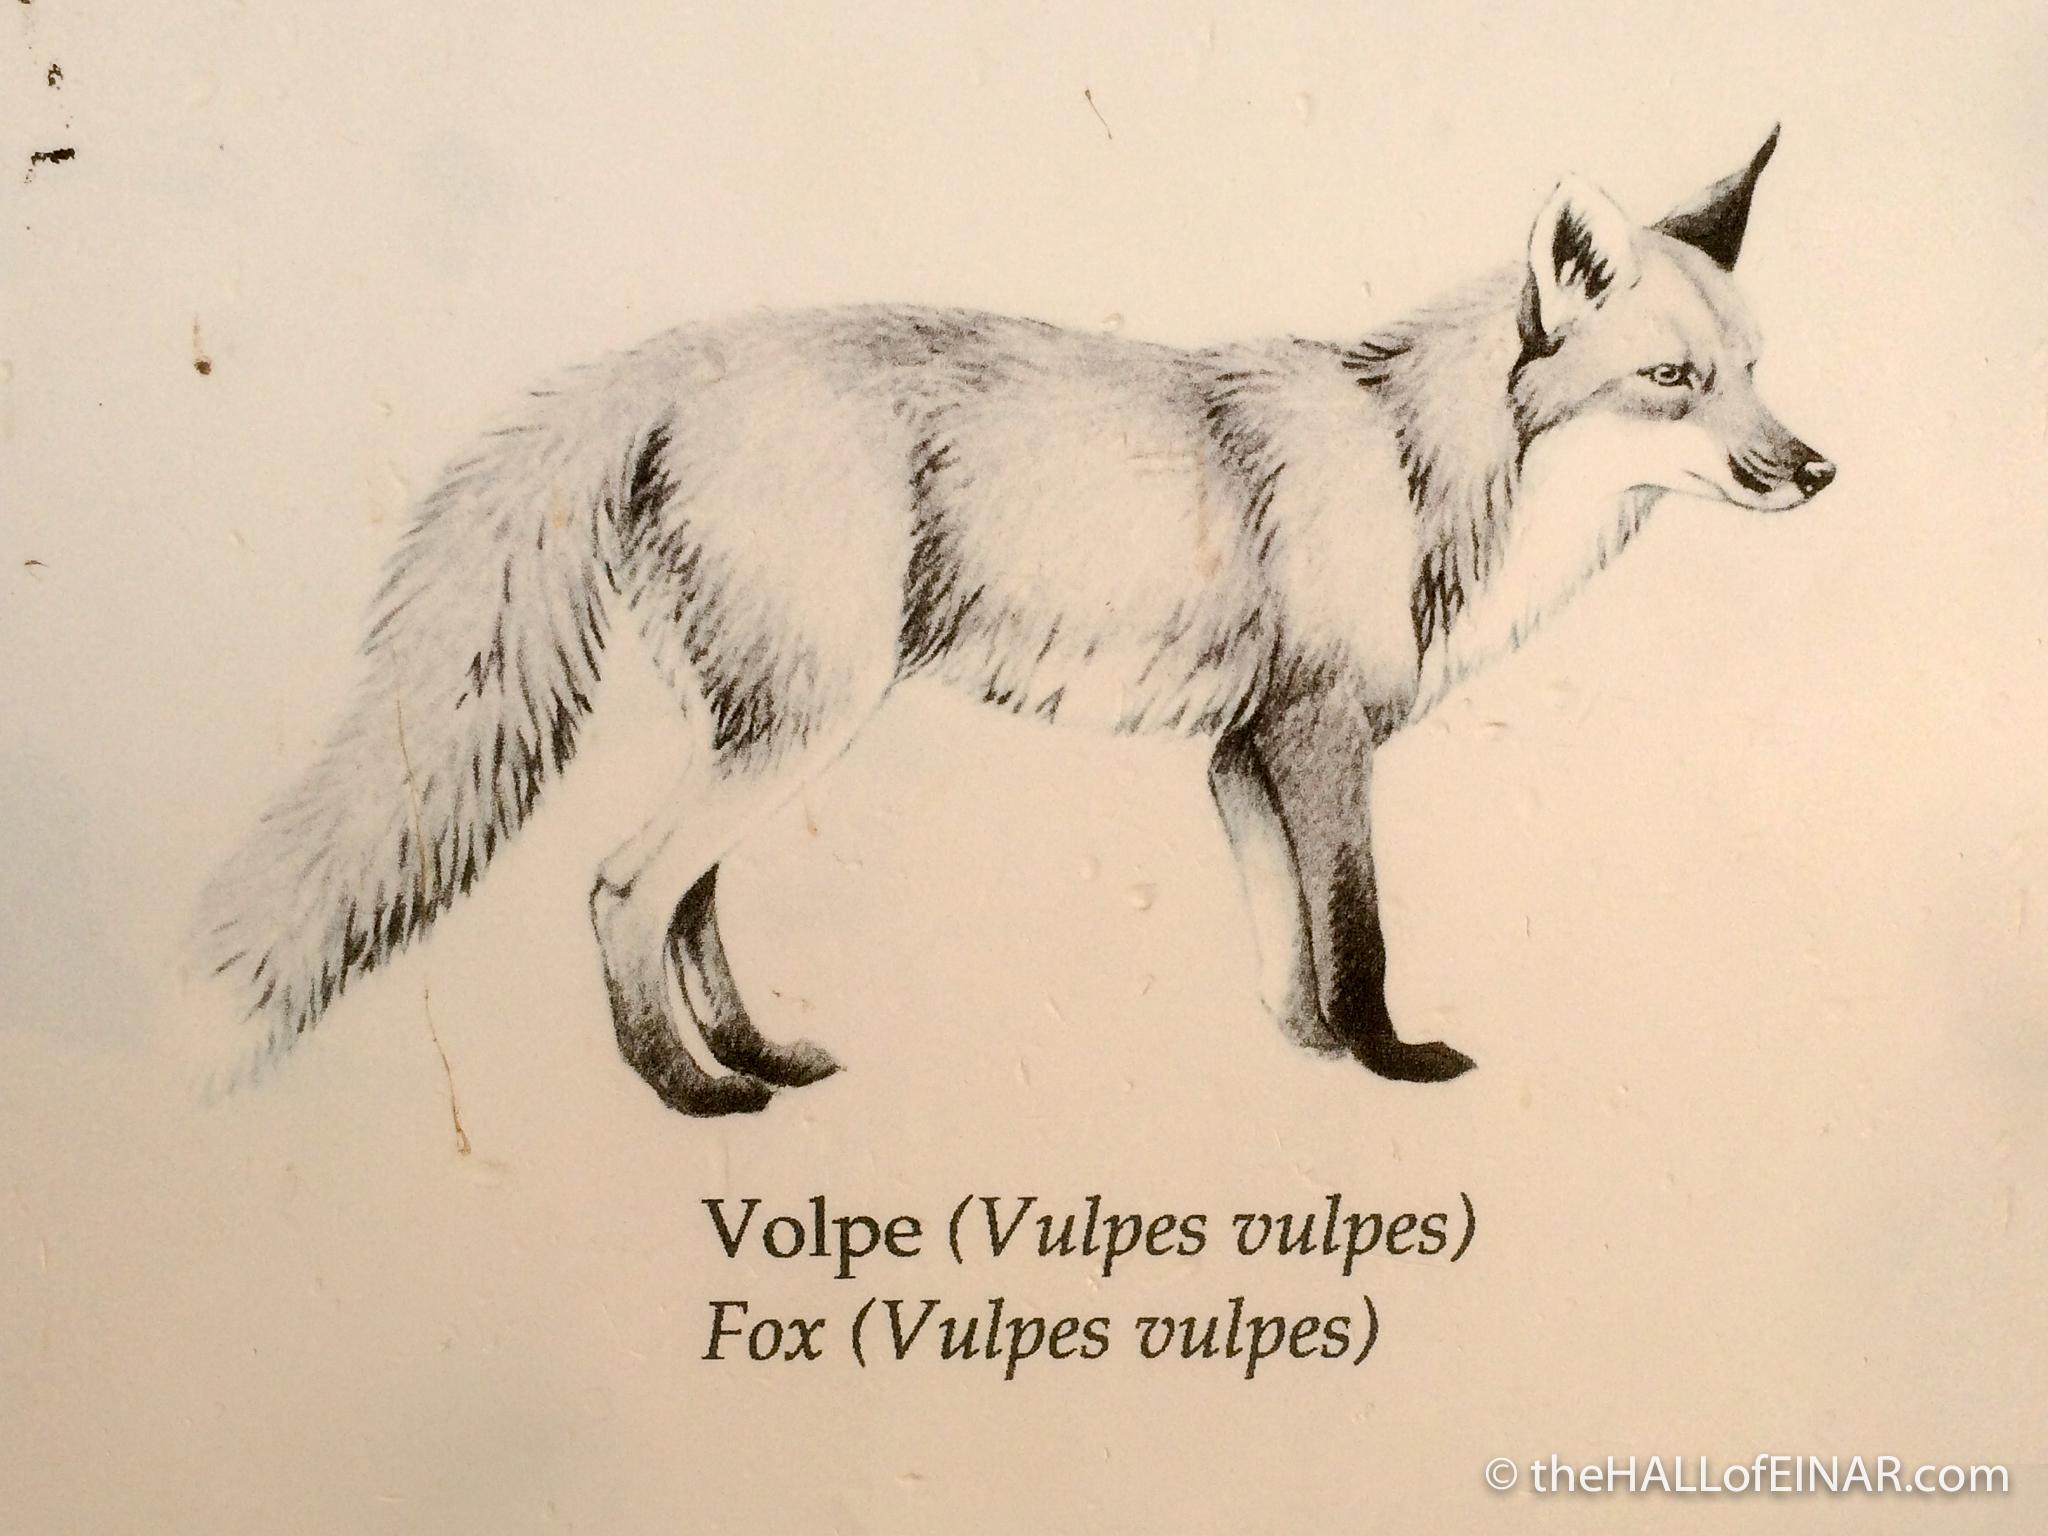 Fox - The Hall of Einar - photograph (c) David Bailey (not the)